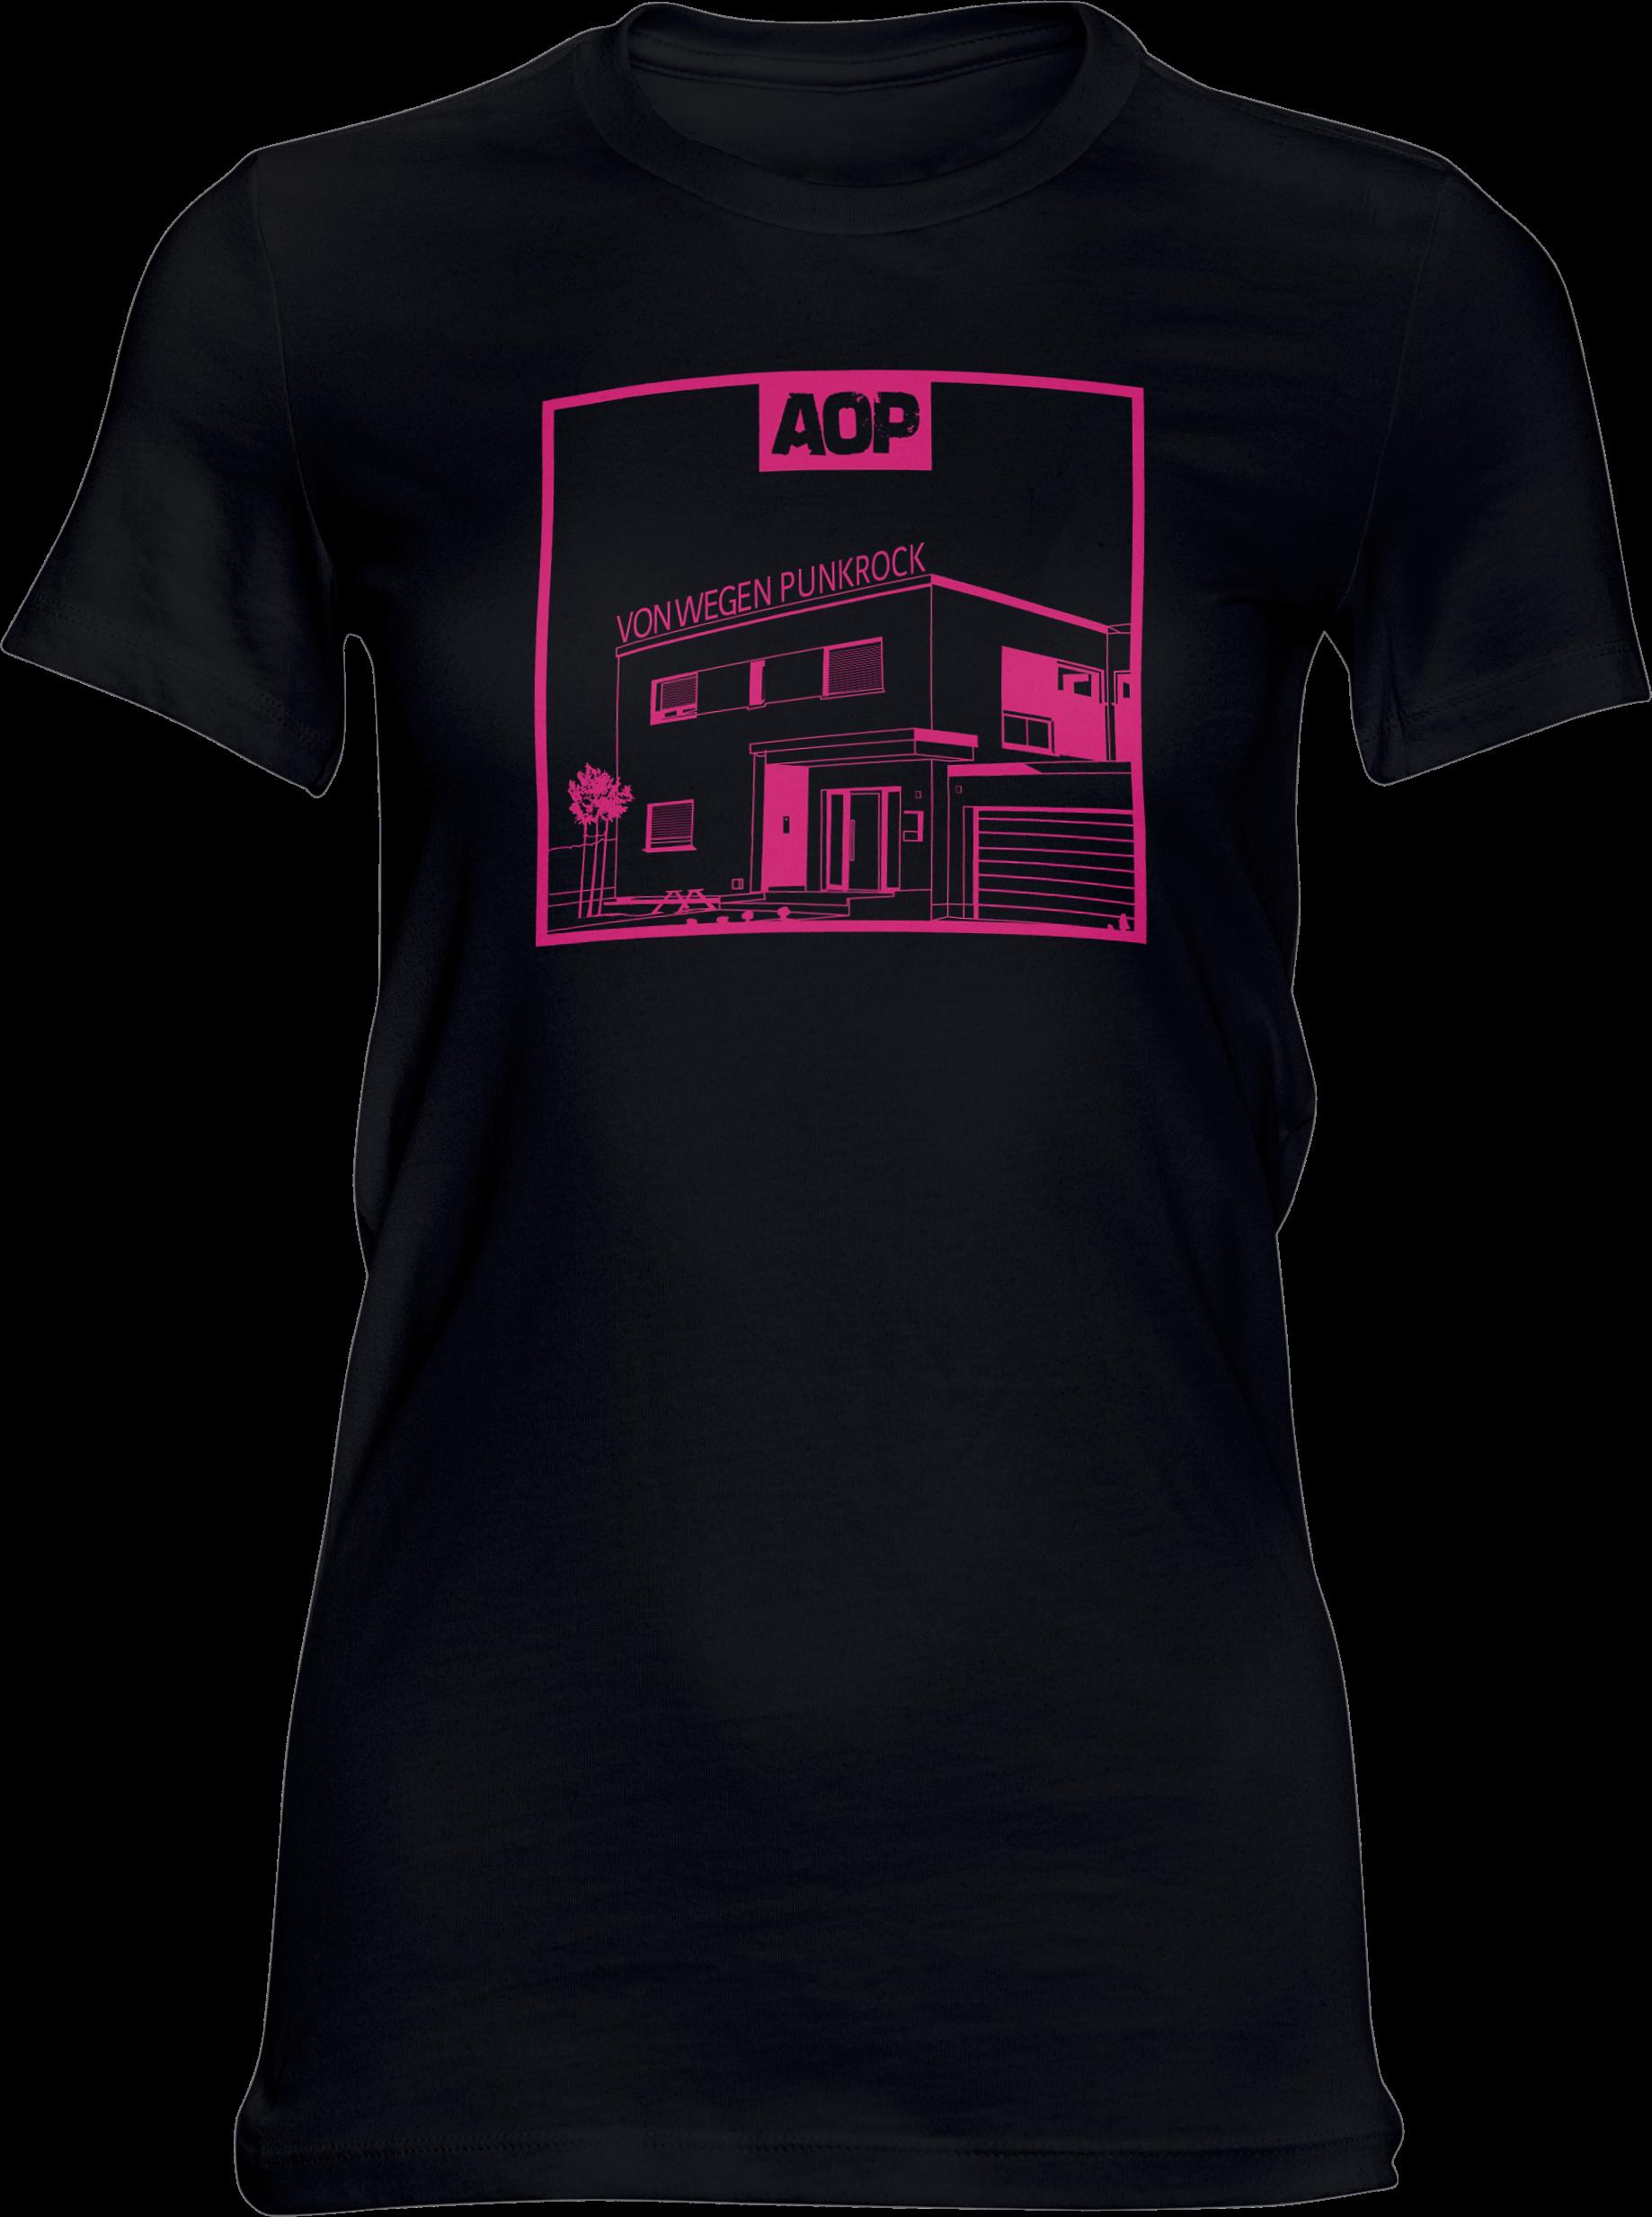 AOP – Von wegen Punkrock – Girlie-Shirt (schwarz)